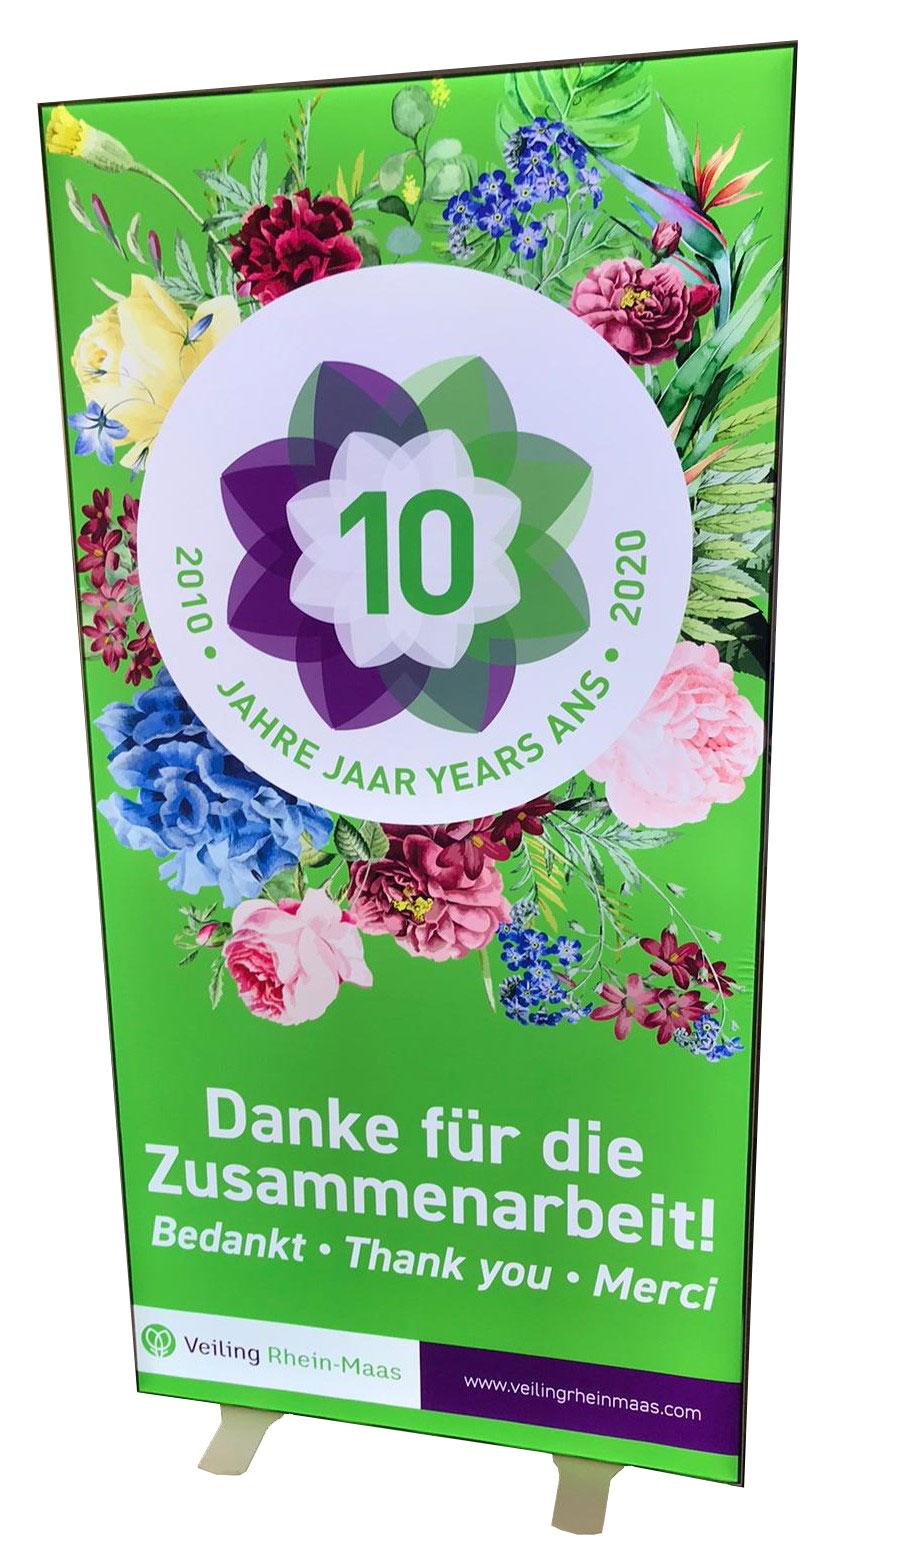 Lightbox-10-Jahre-Veiling-Rhein-Maas[1].